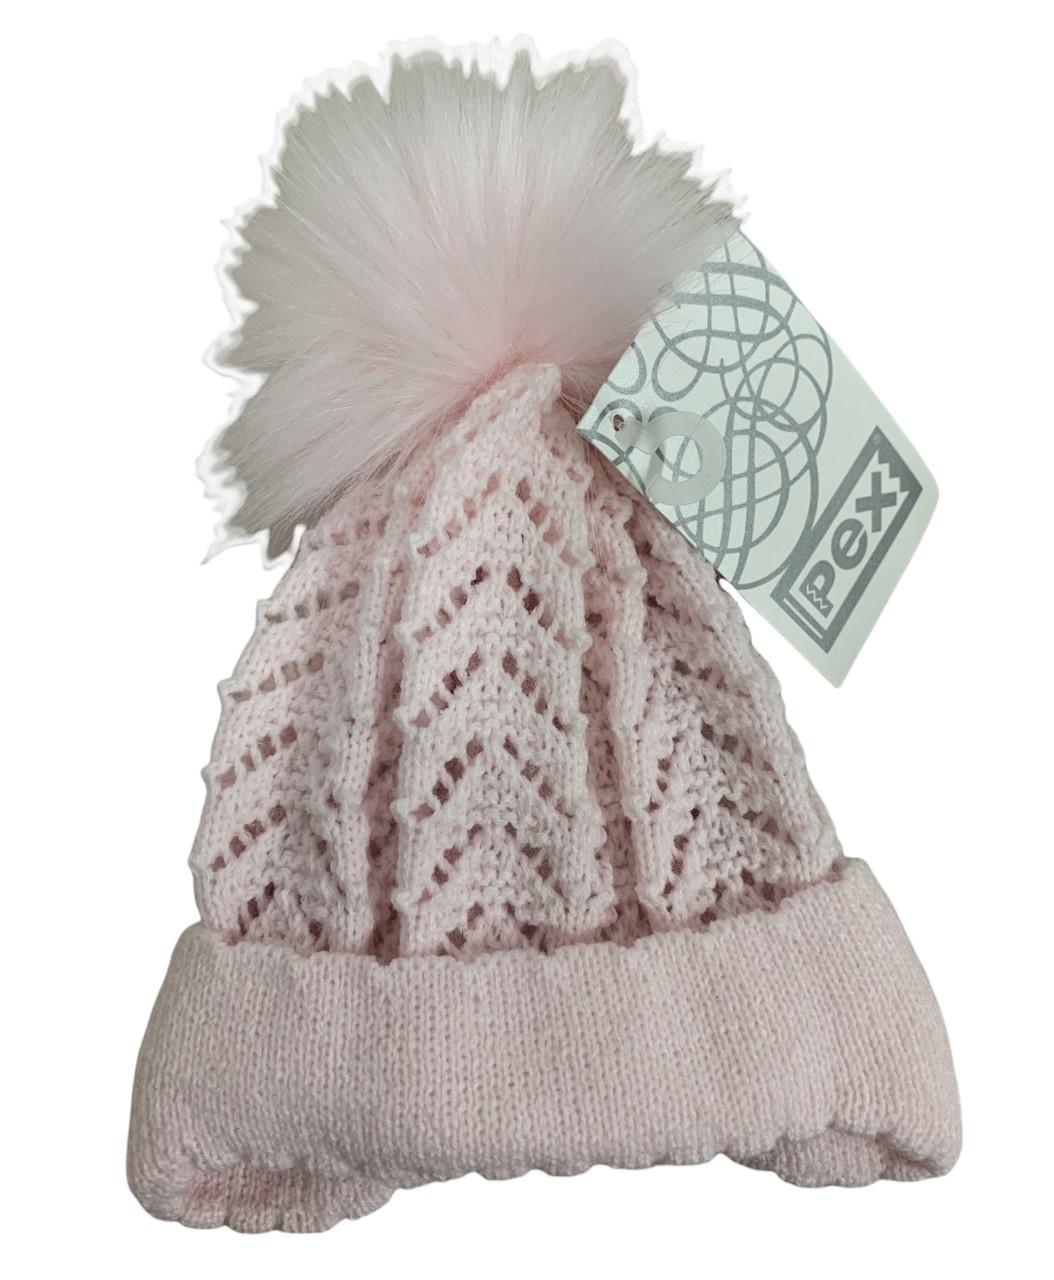 Pex Pex Knit Pink Hat With Faux Fur Pom - 6-12M